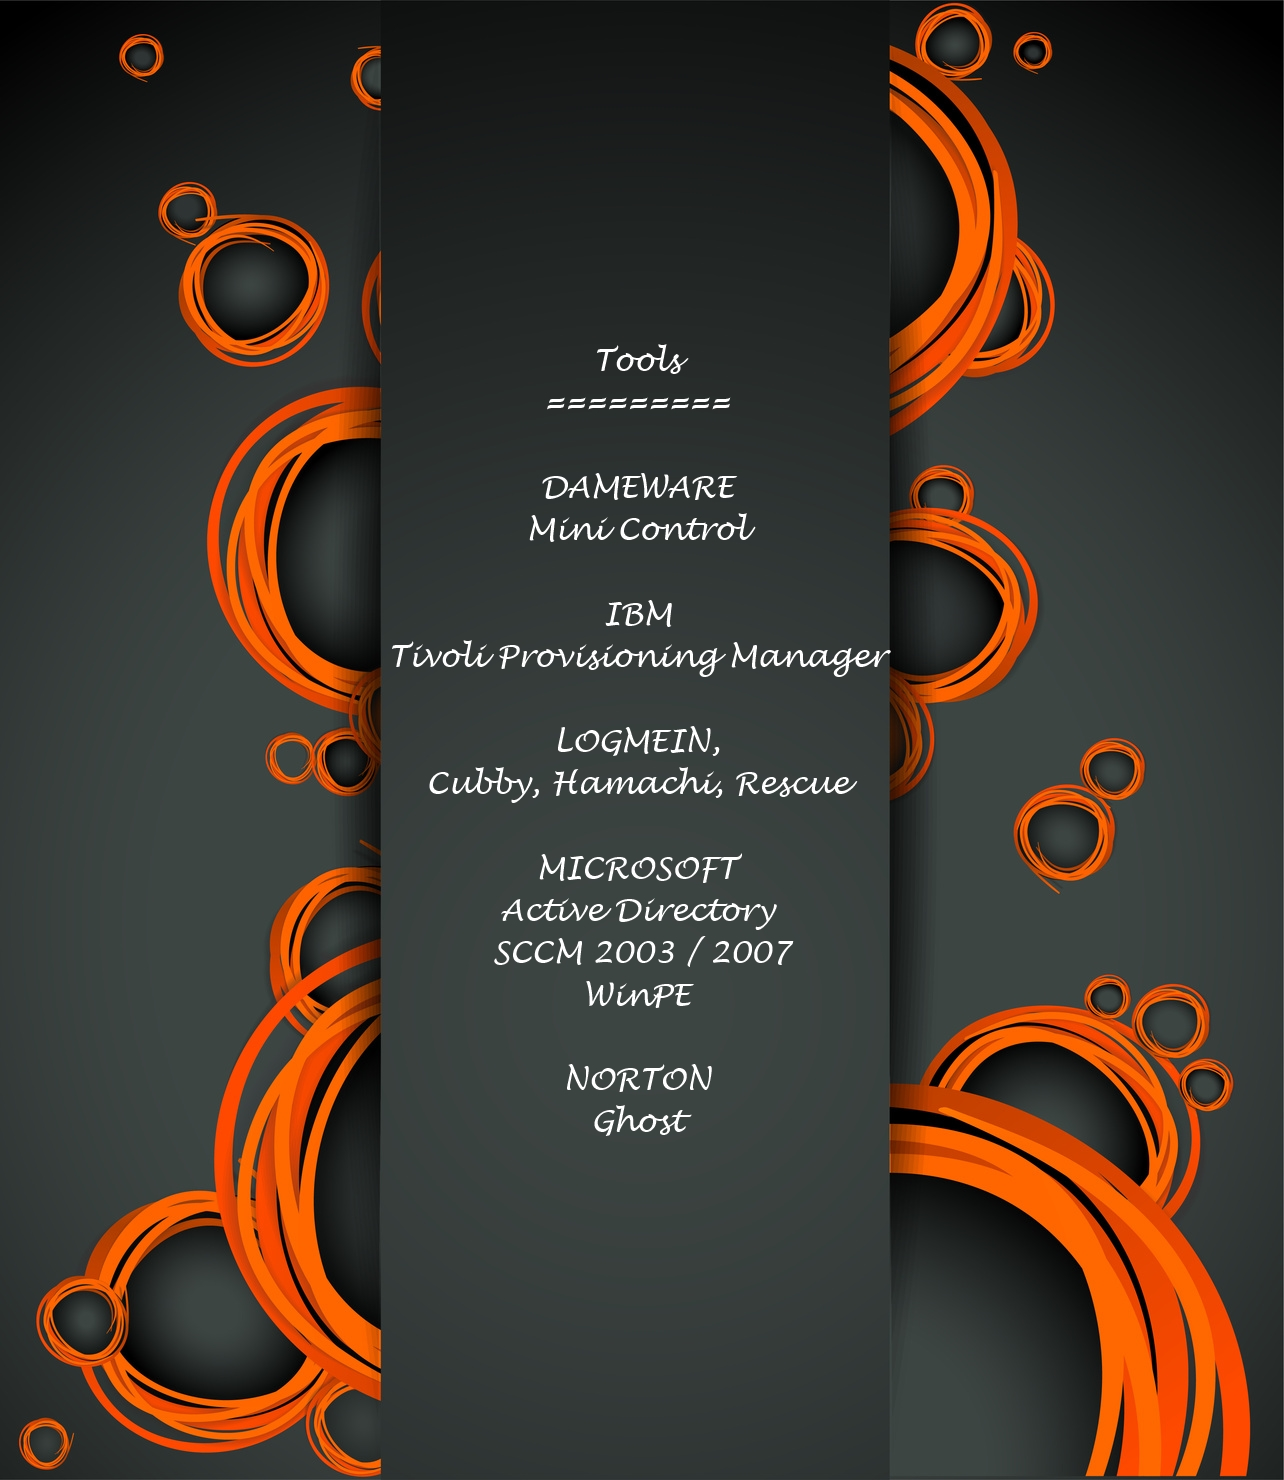 4_connoisseur_tools.jpg